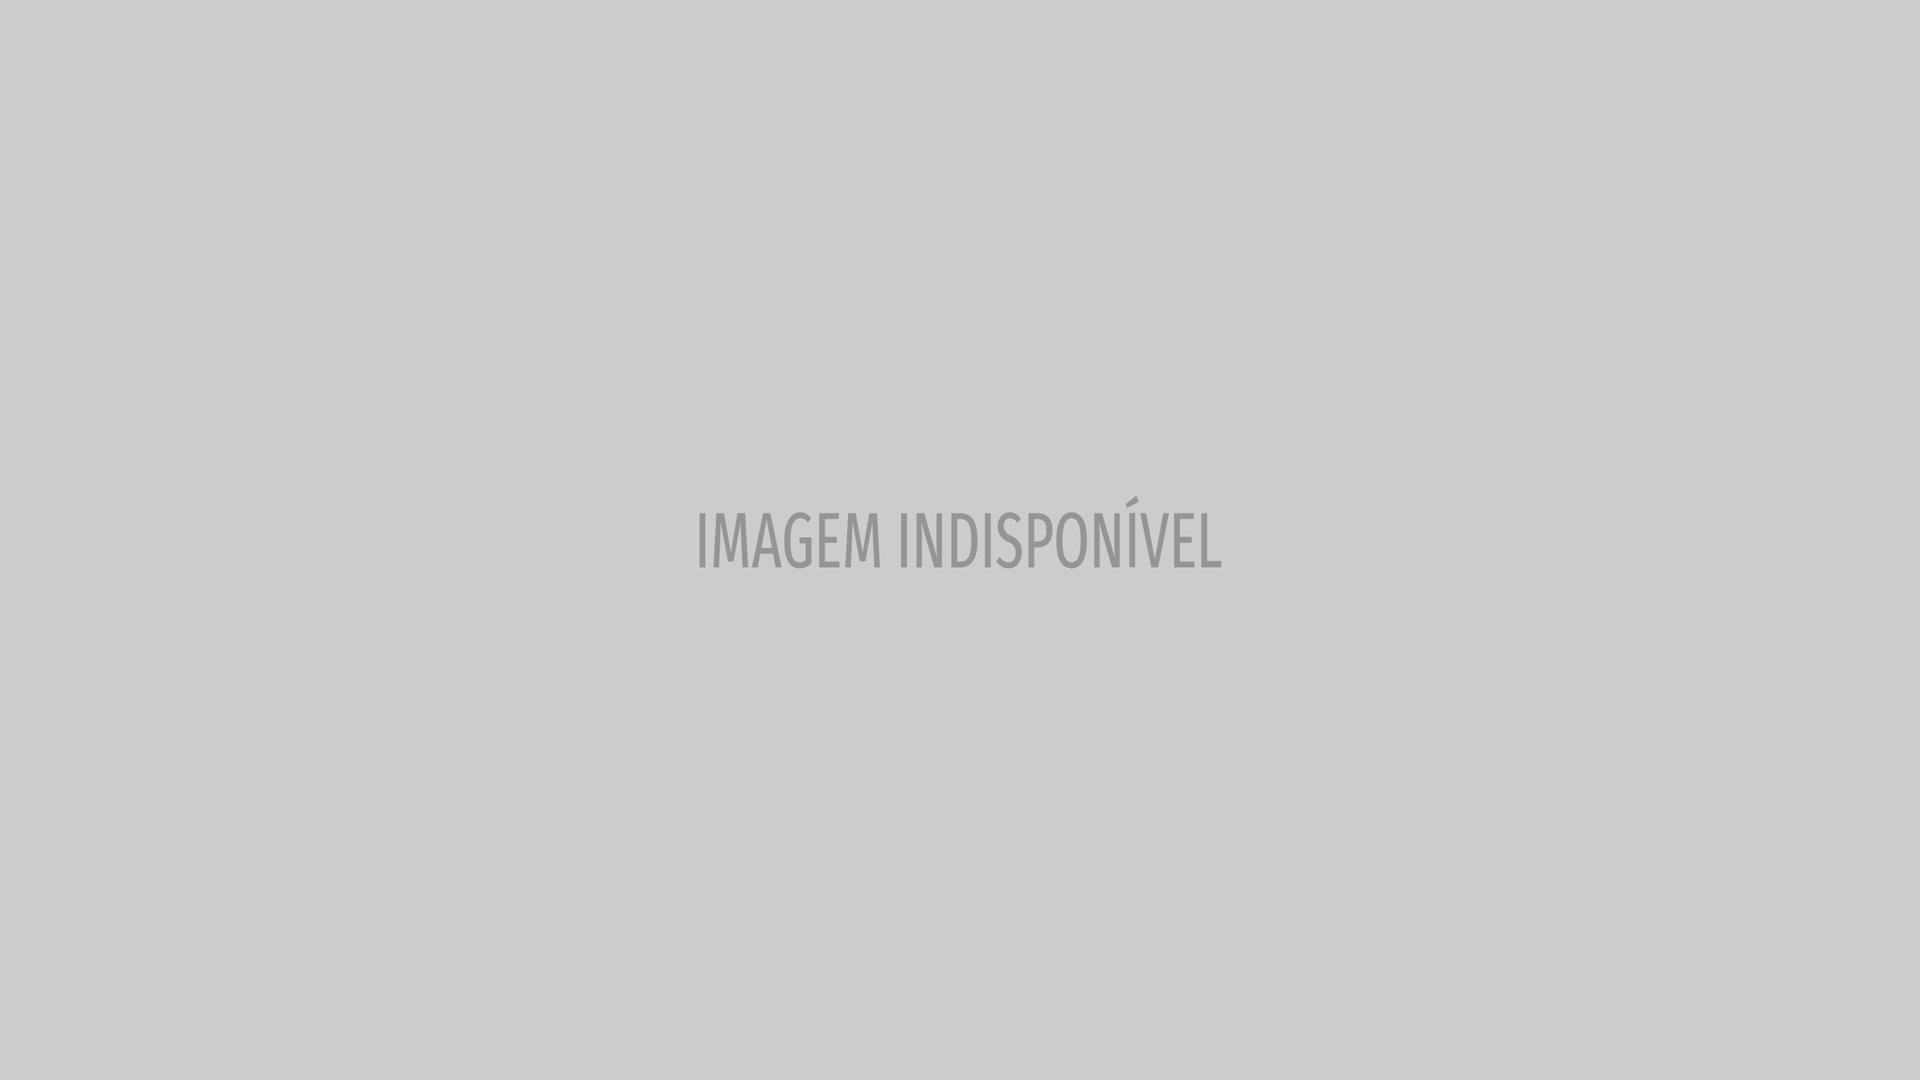 Maria Cândida deixa redes sociais após ex-namorado expor término